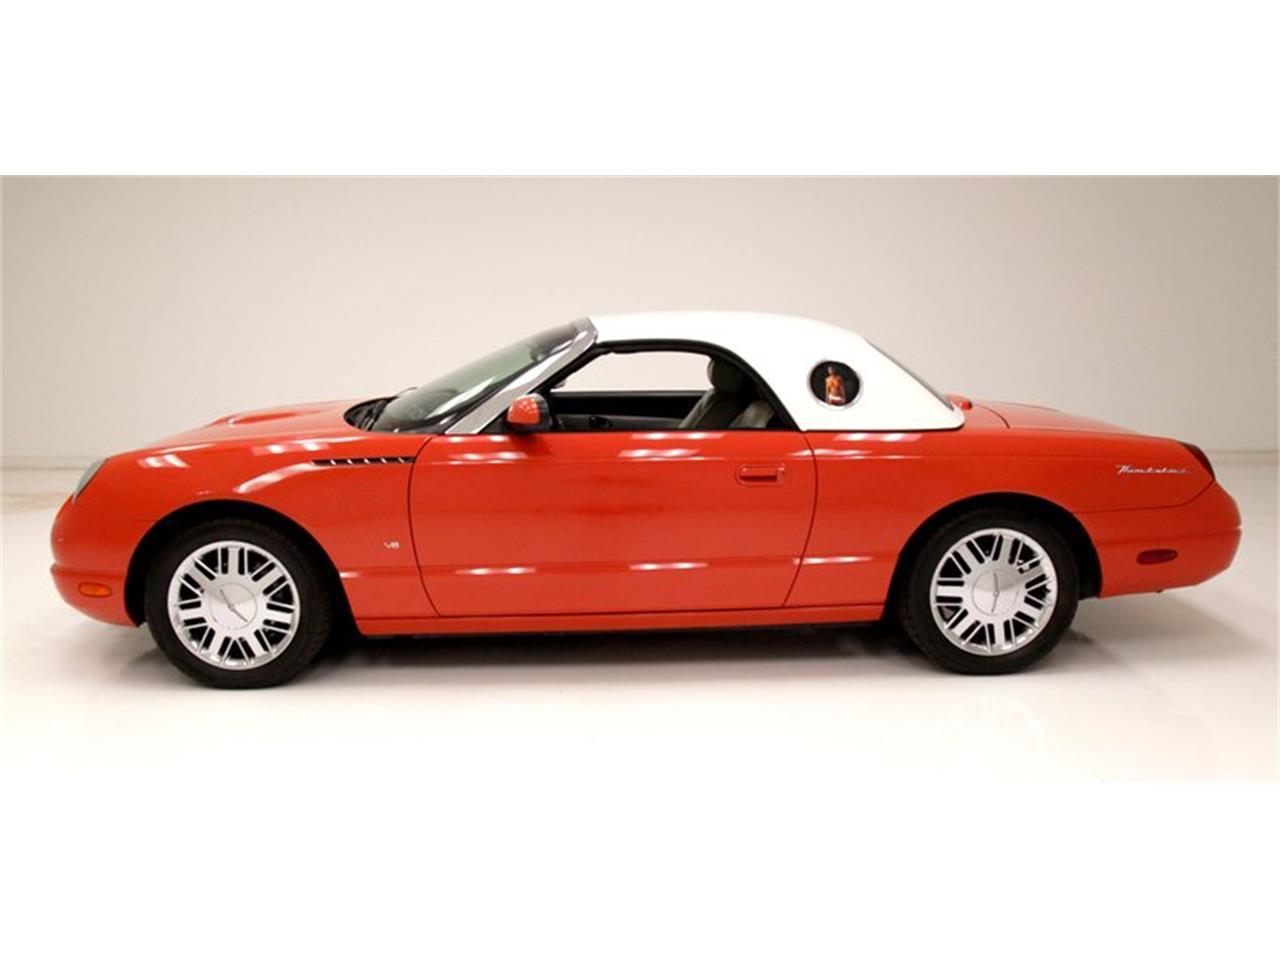 2003 Ford Thunderbird (CC-1415701) for sale in Morgantown, Pennsylvania